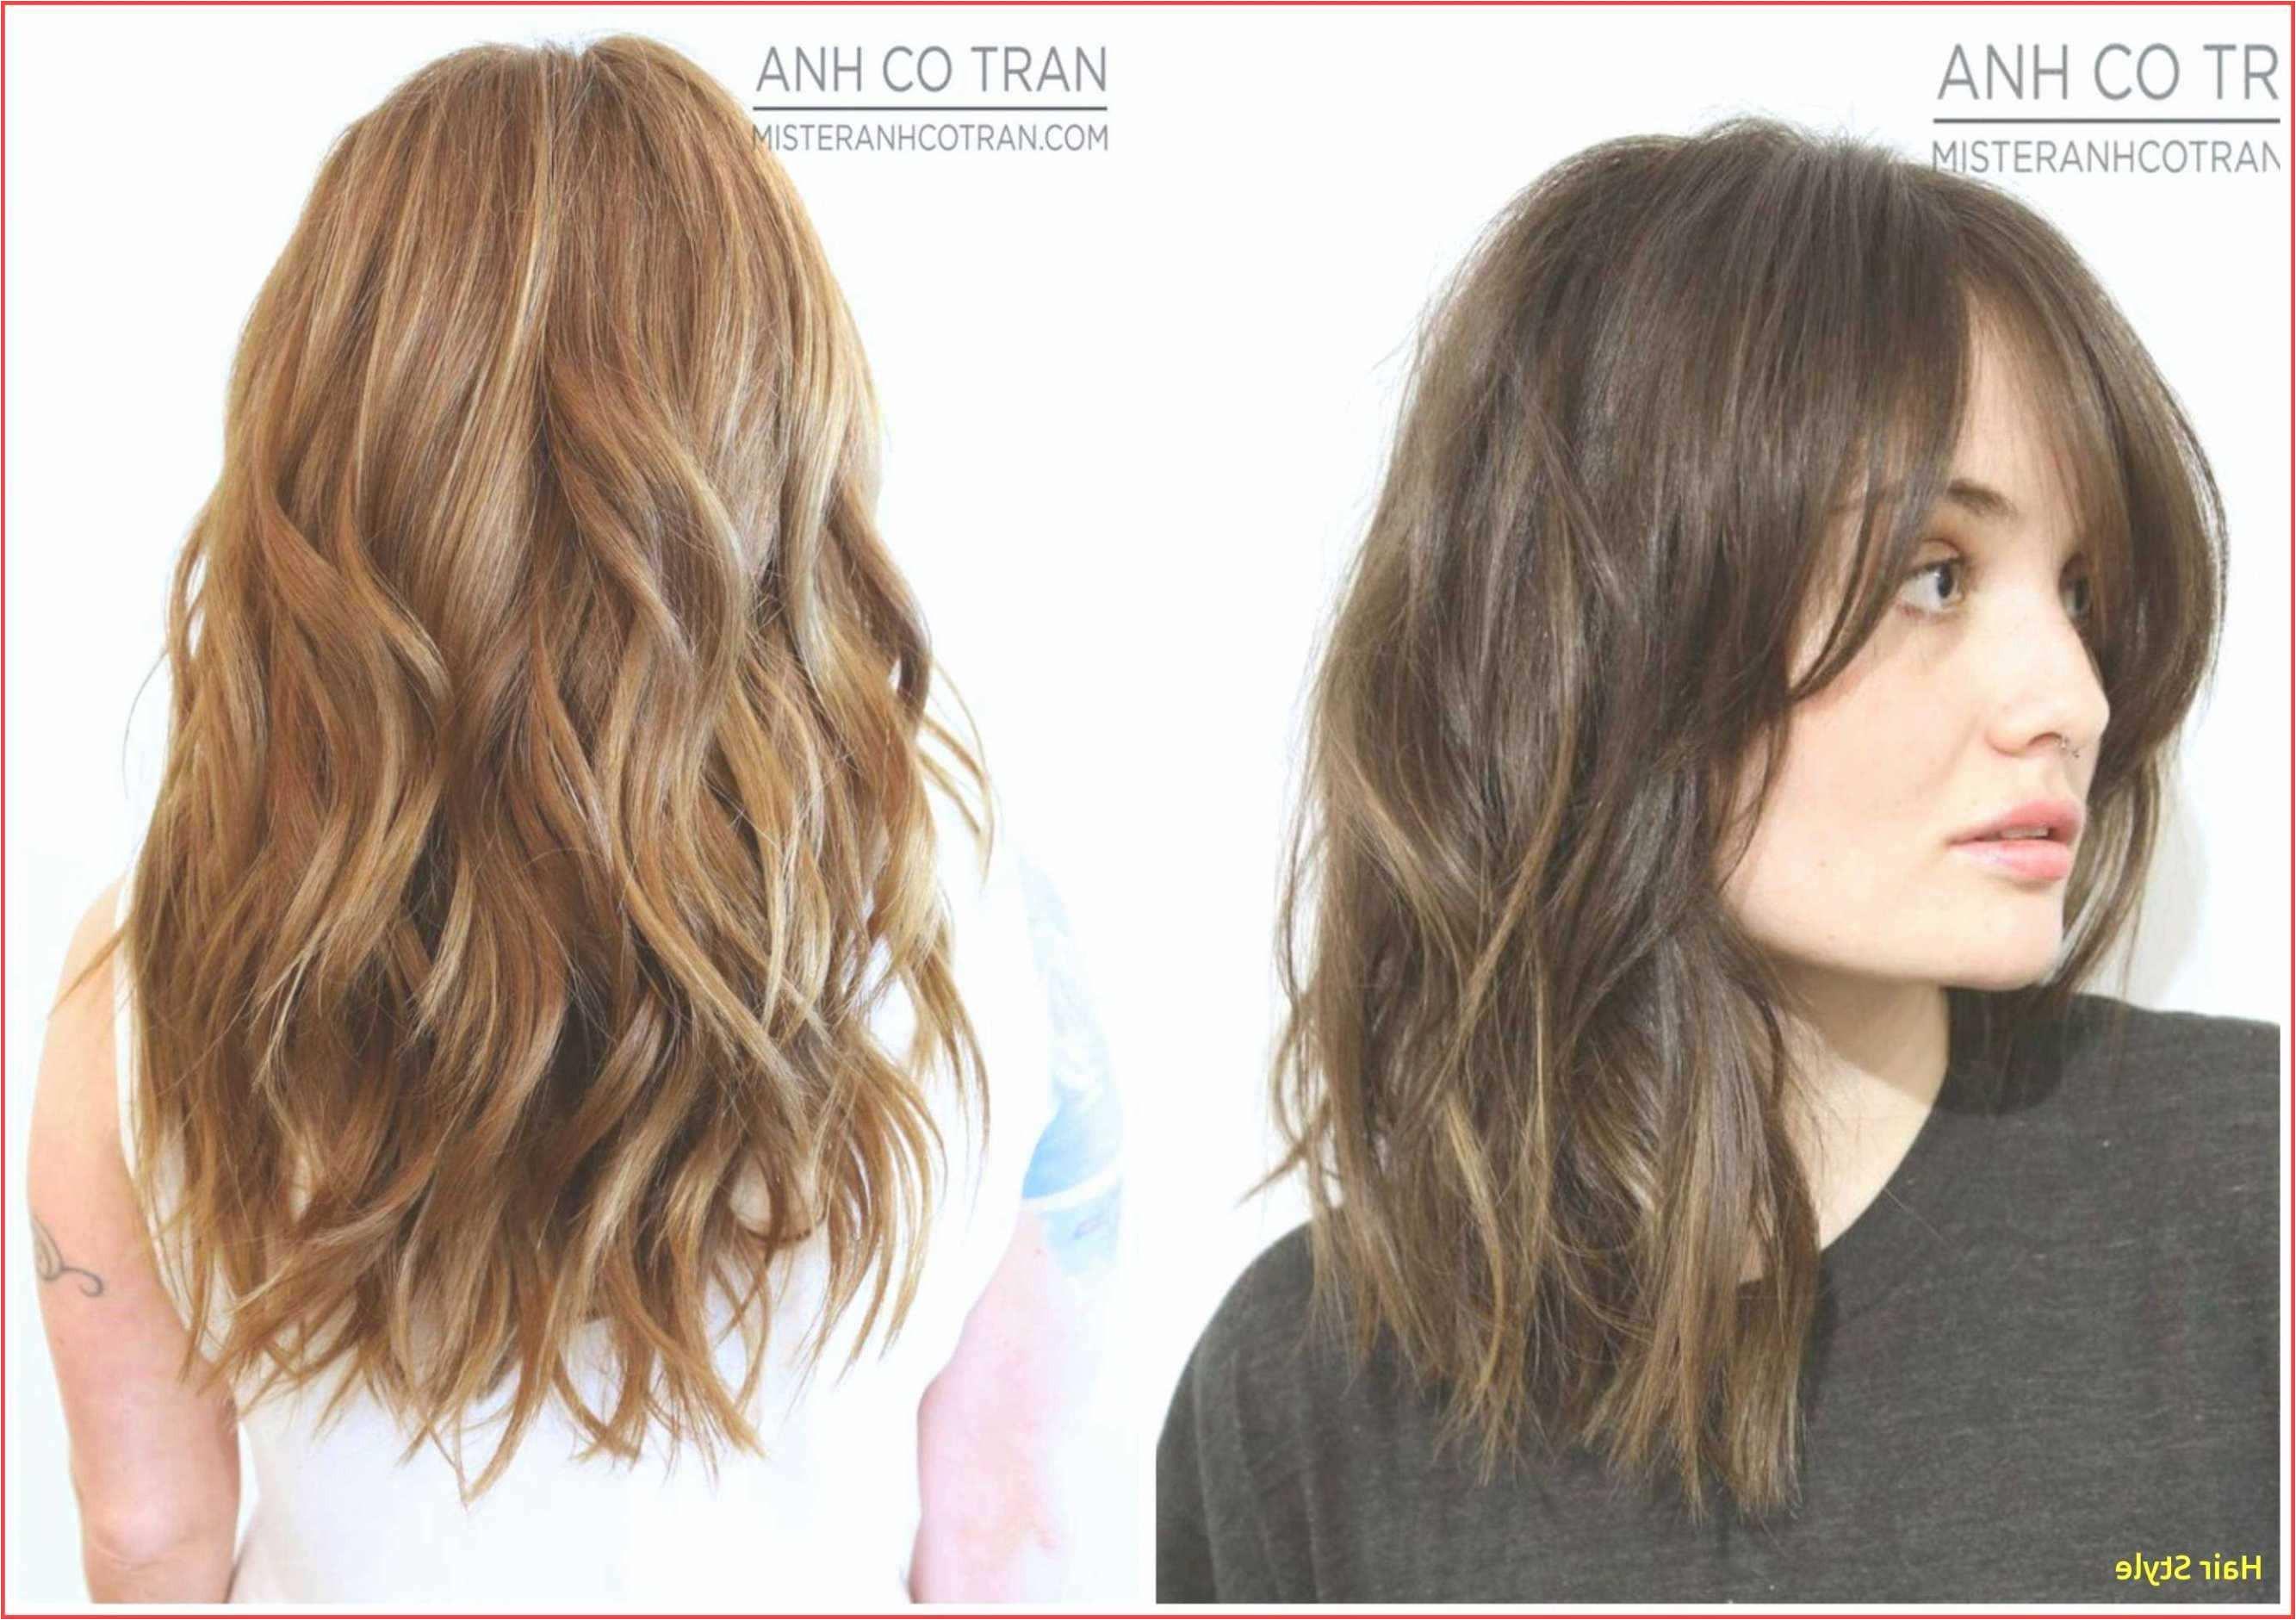 Asian Hairstyles For Long Hair Fresh New Short Wavy Asian Hairstyles – Uternity